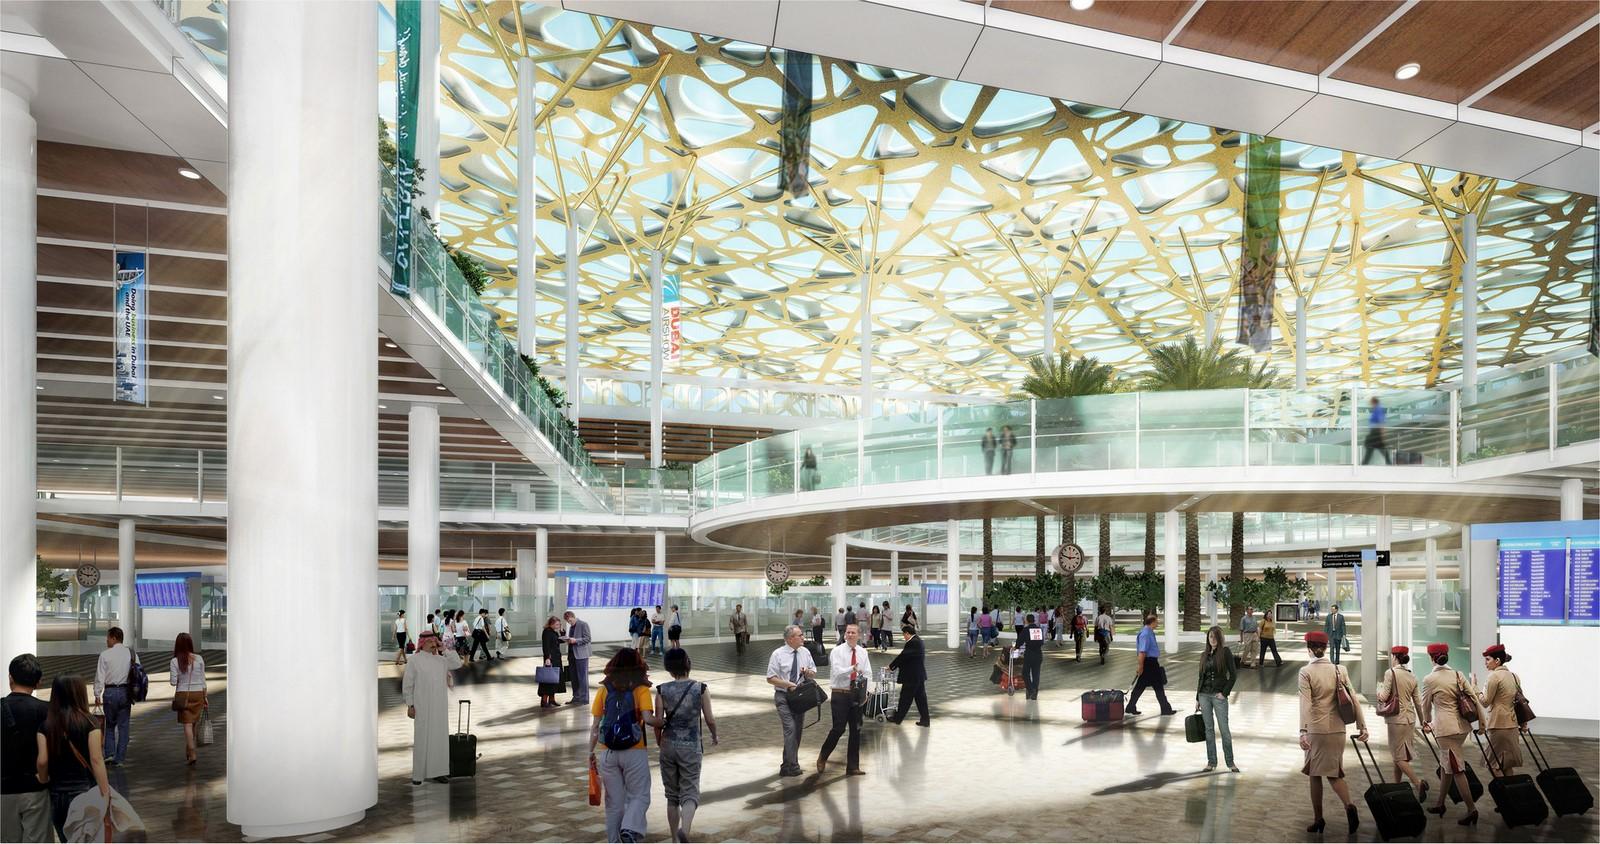 Al Maktoum International Airport, Dubai: World's first purpose-built aerotropolis - Sheet8